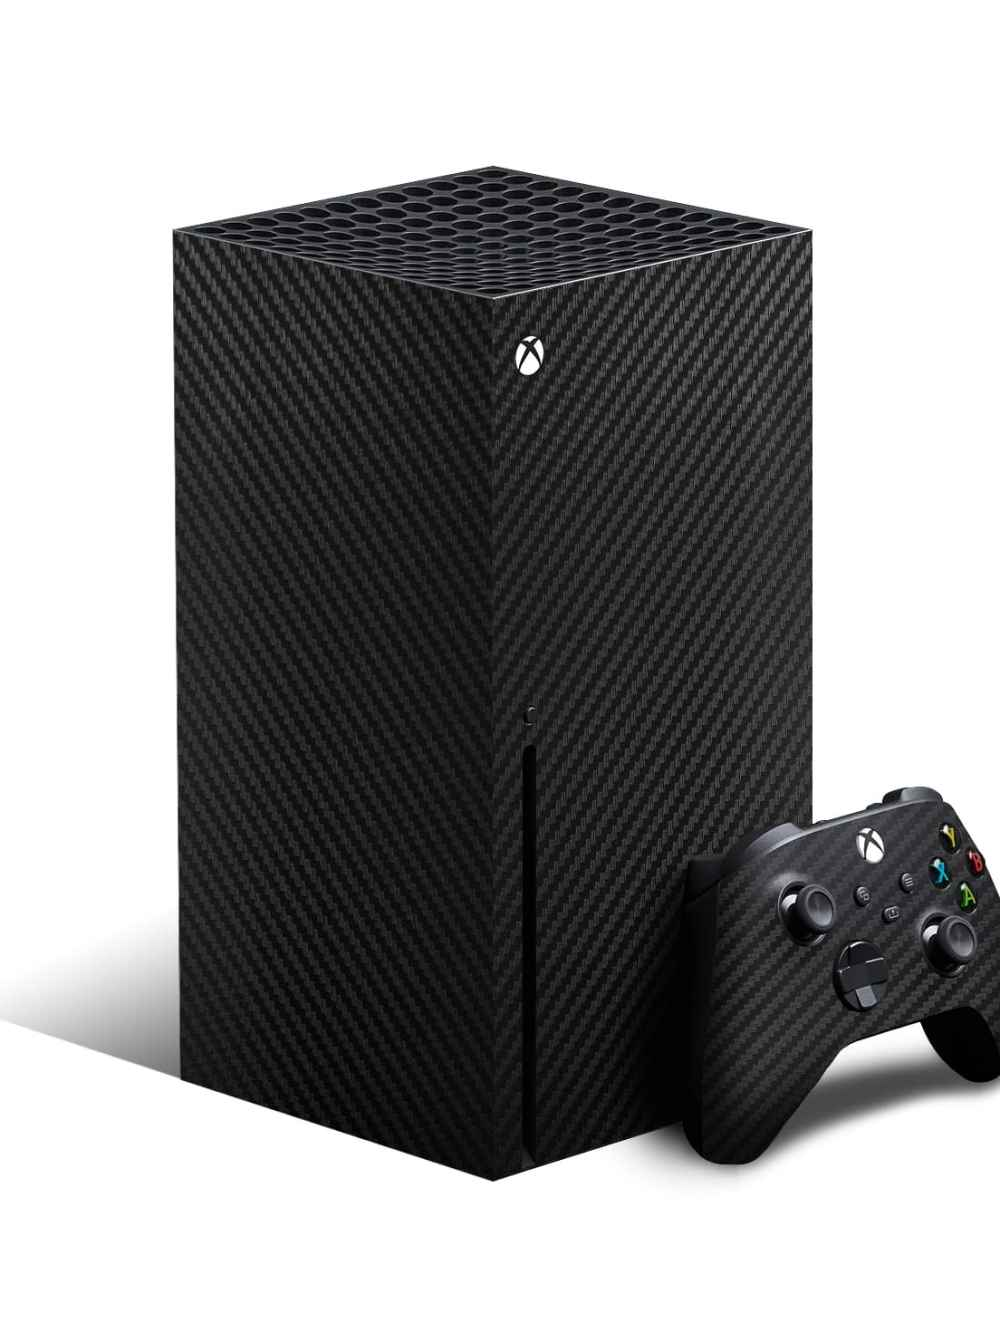 Xbox Series X Carbon Fibre Skin Wrap